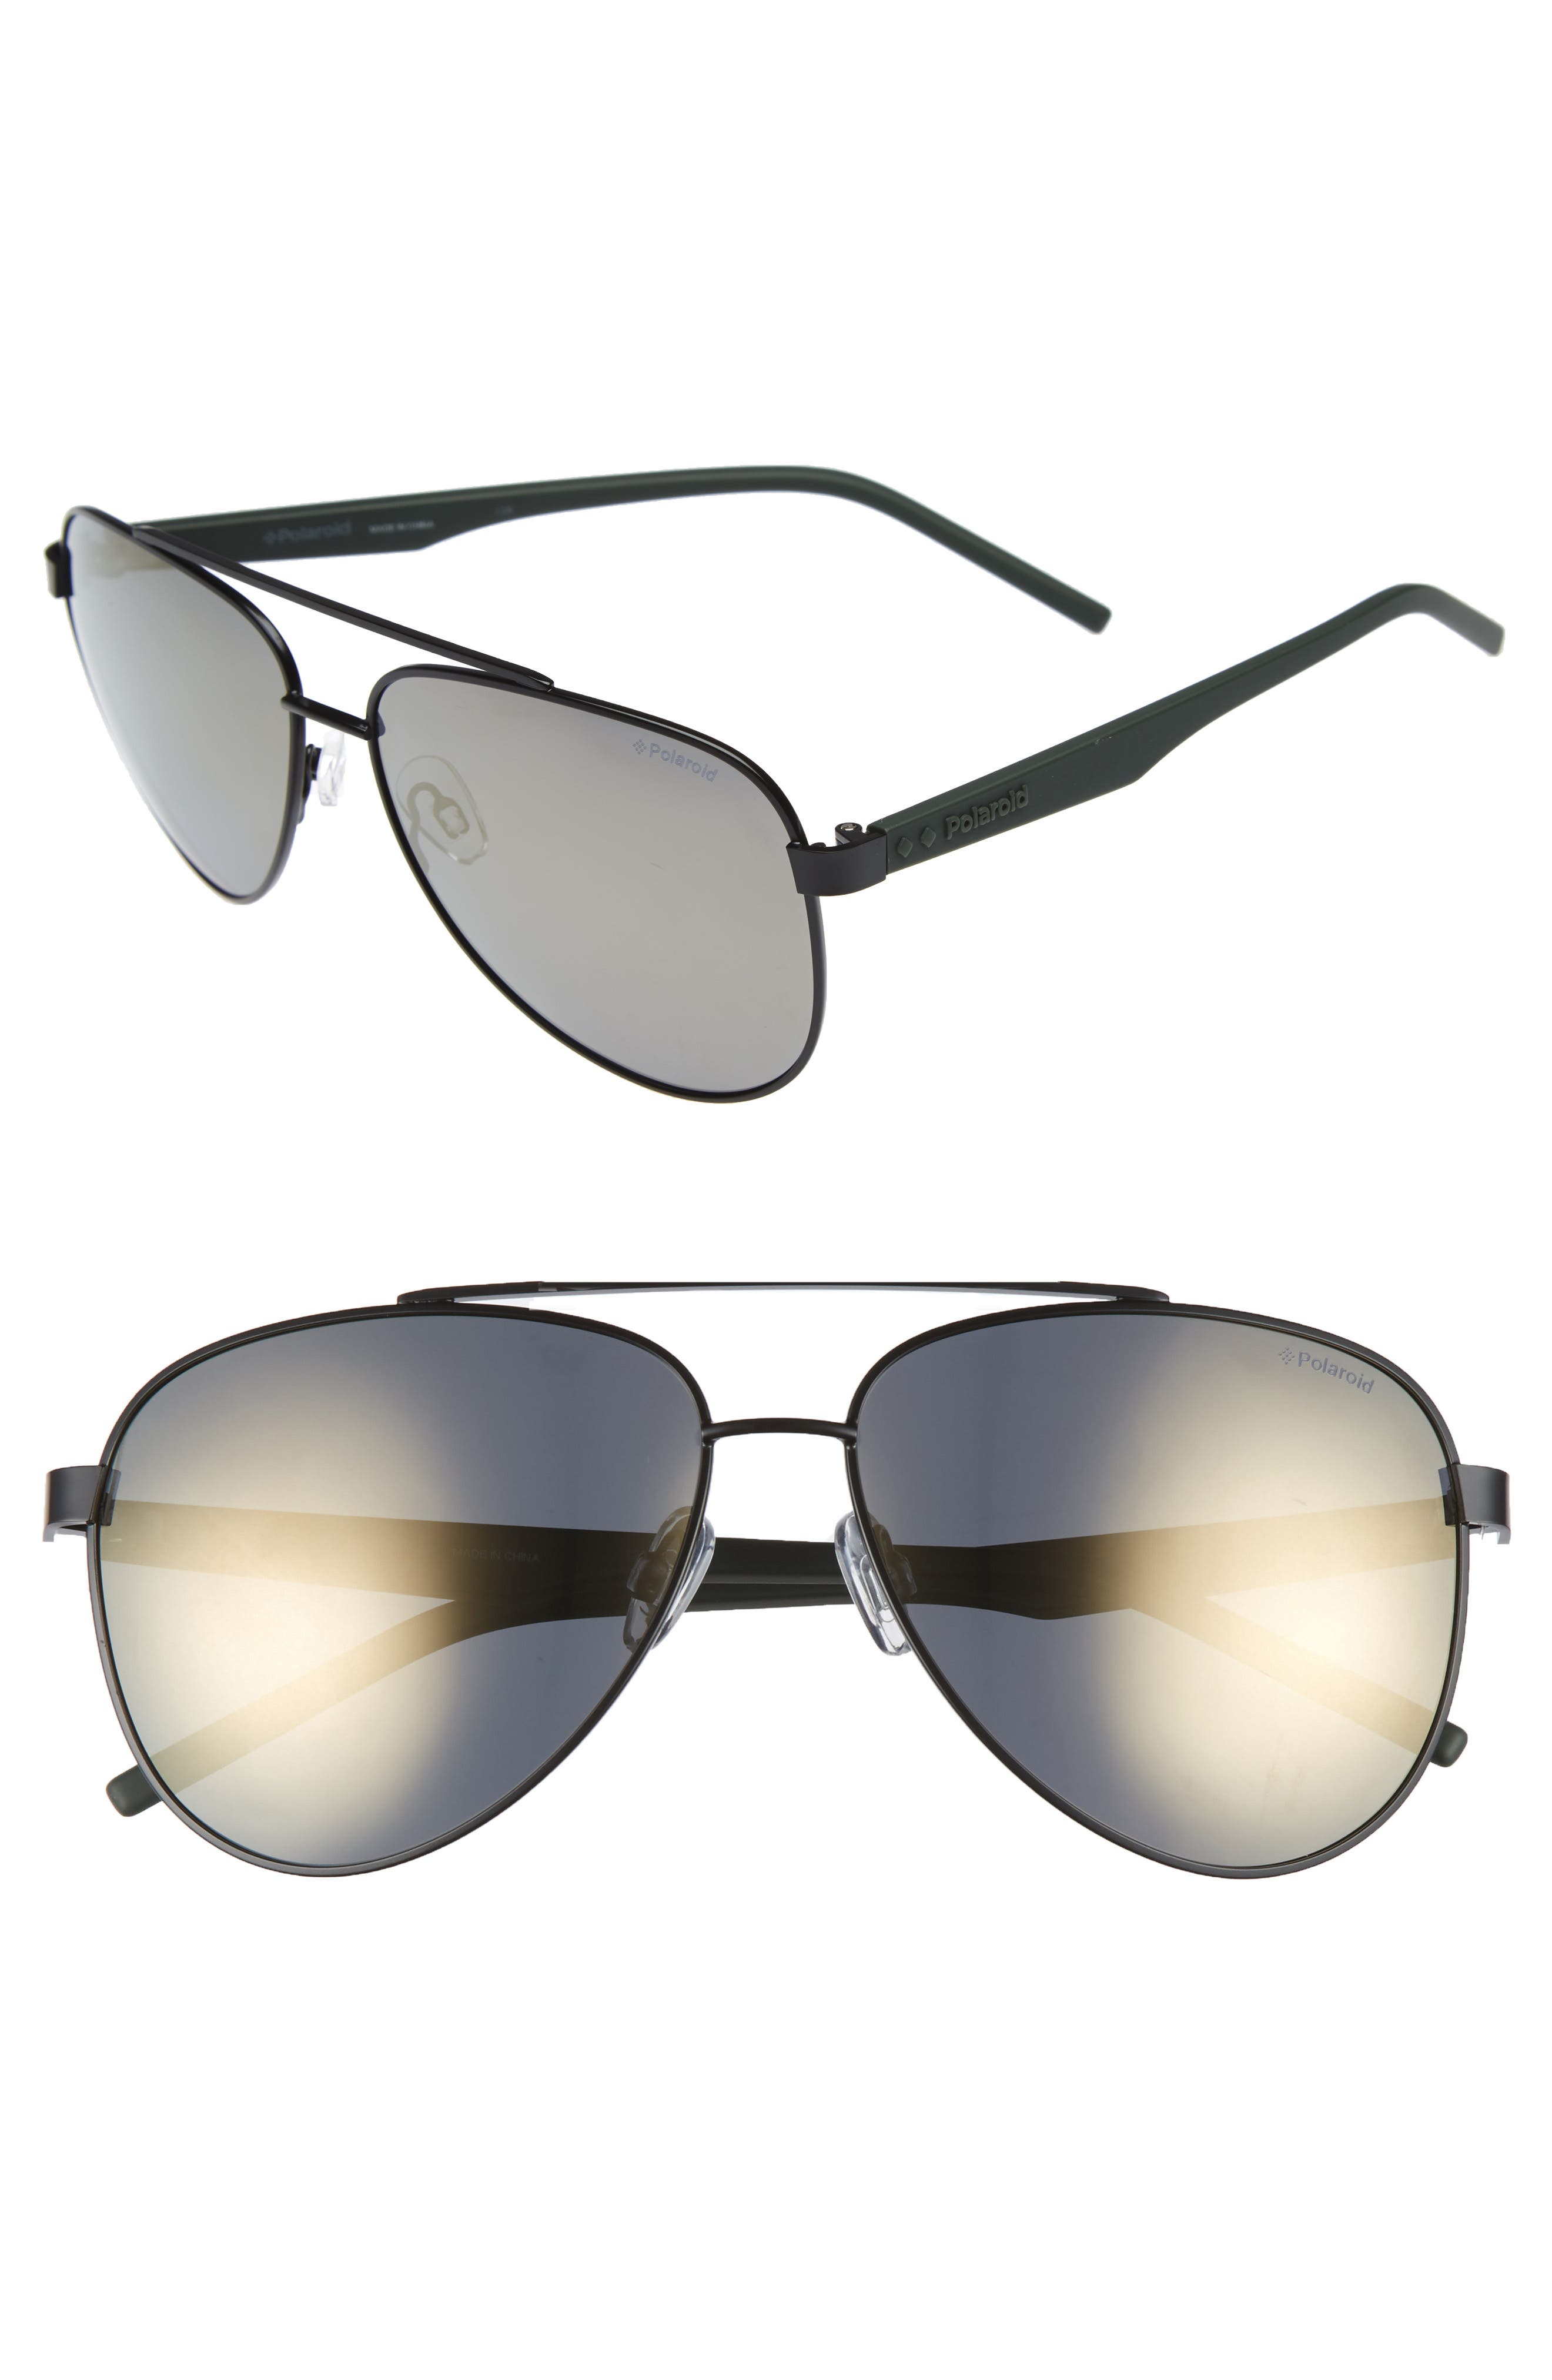 Polaroid 61mm Polarized Aviator Sunglasses,                             Main thumbnail 1, color,                             001